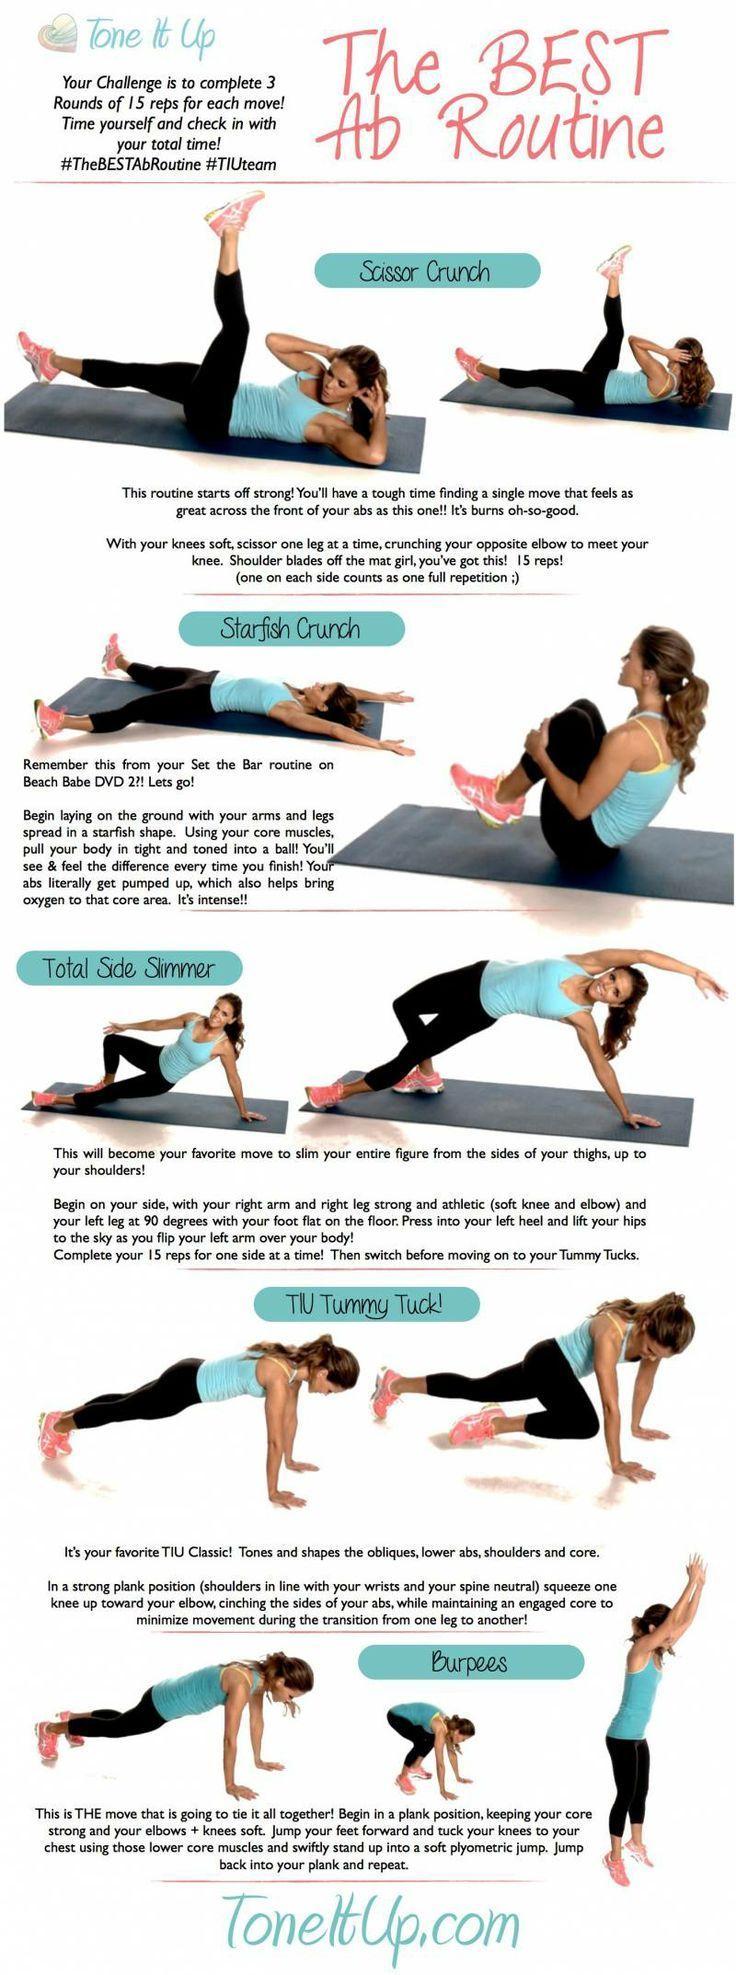 Tone It Up & Lauren Conrad: the best ab workout routine